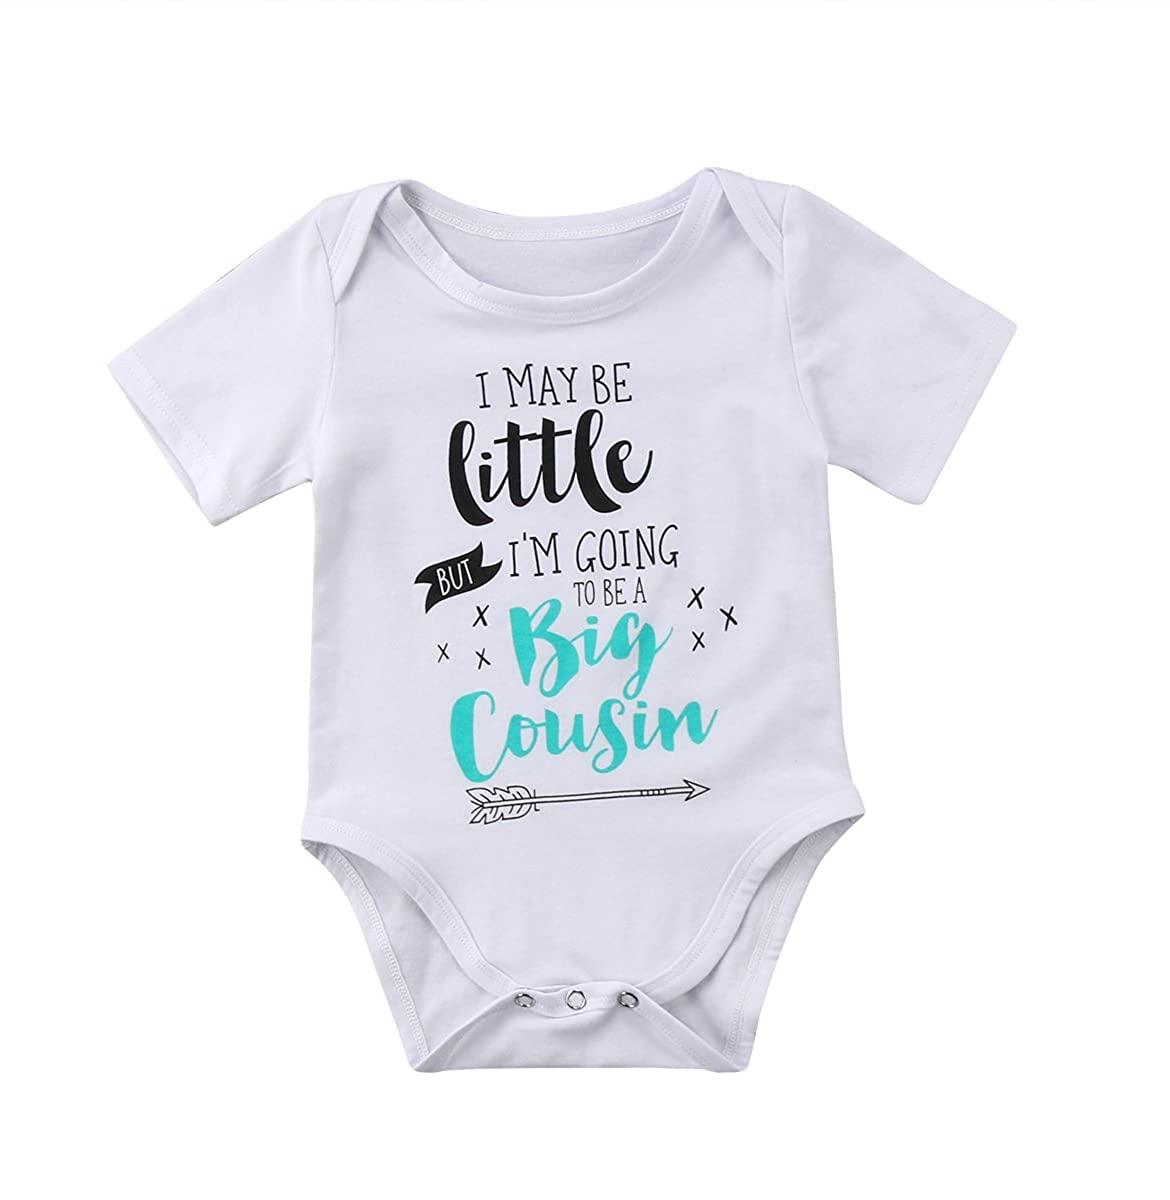 WALLARENEAR Summer Newborn Unisex Baby Cotton Bodysuit Letters Print Short Sleeve Romper for Baby Girl Boy